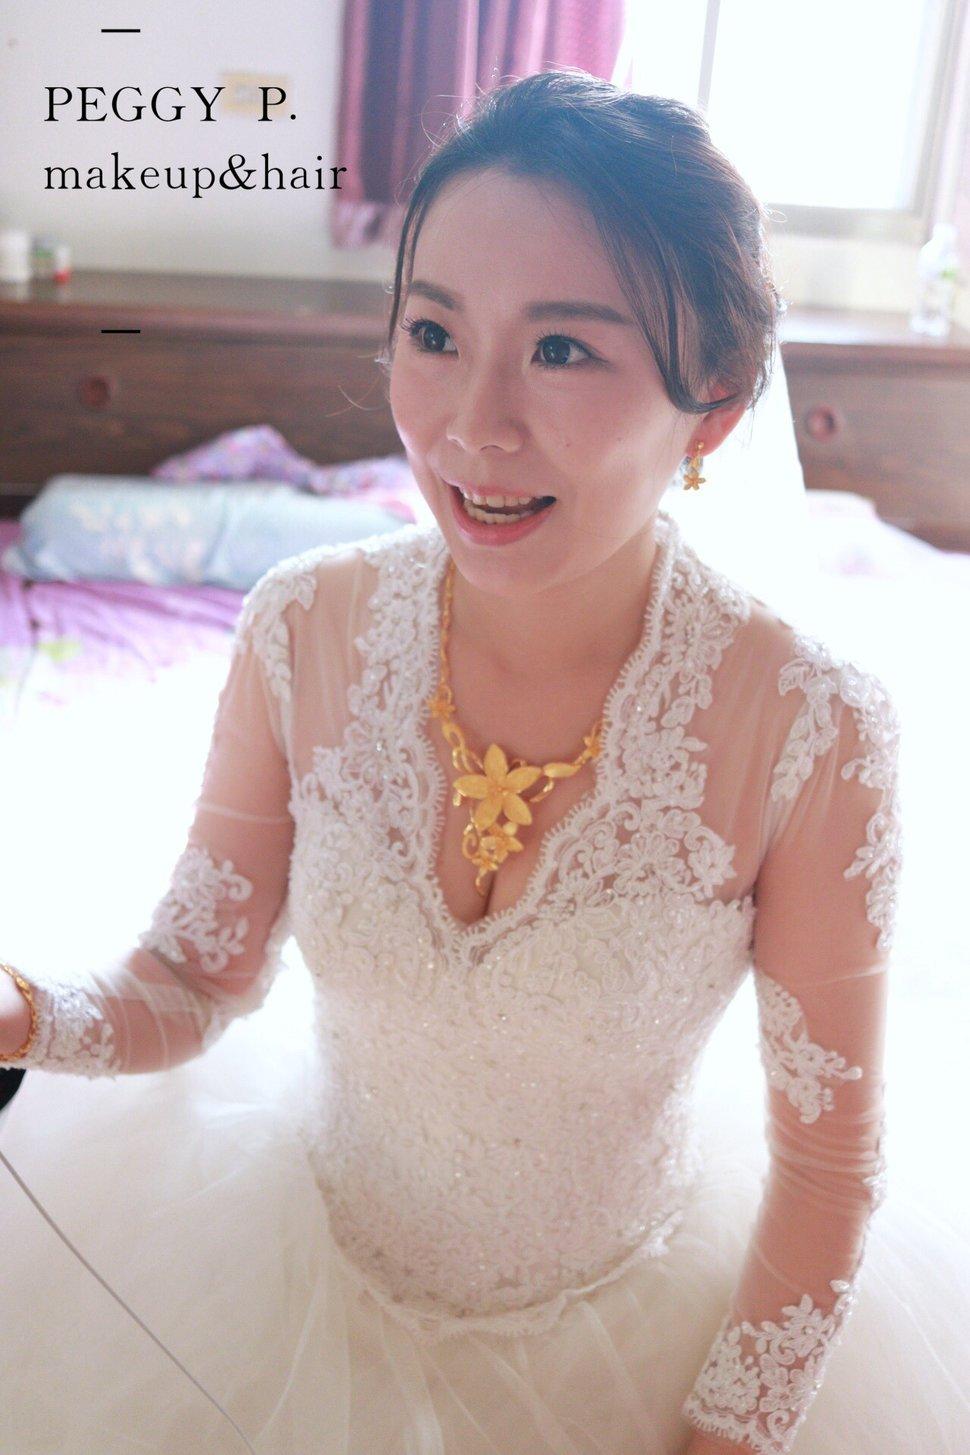 IMG_1049 - Peggy Stylist 全省新秘 - 結婚吧